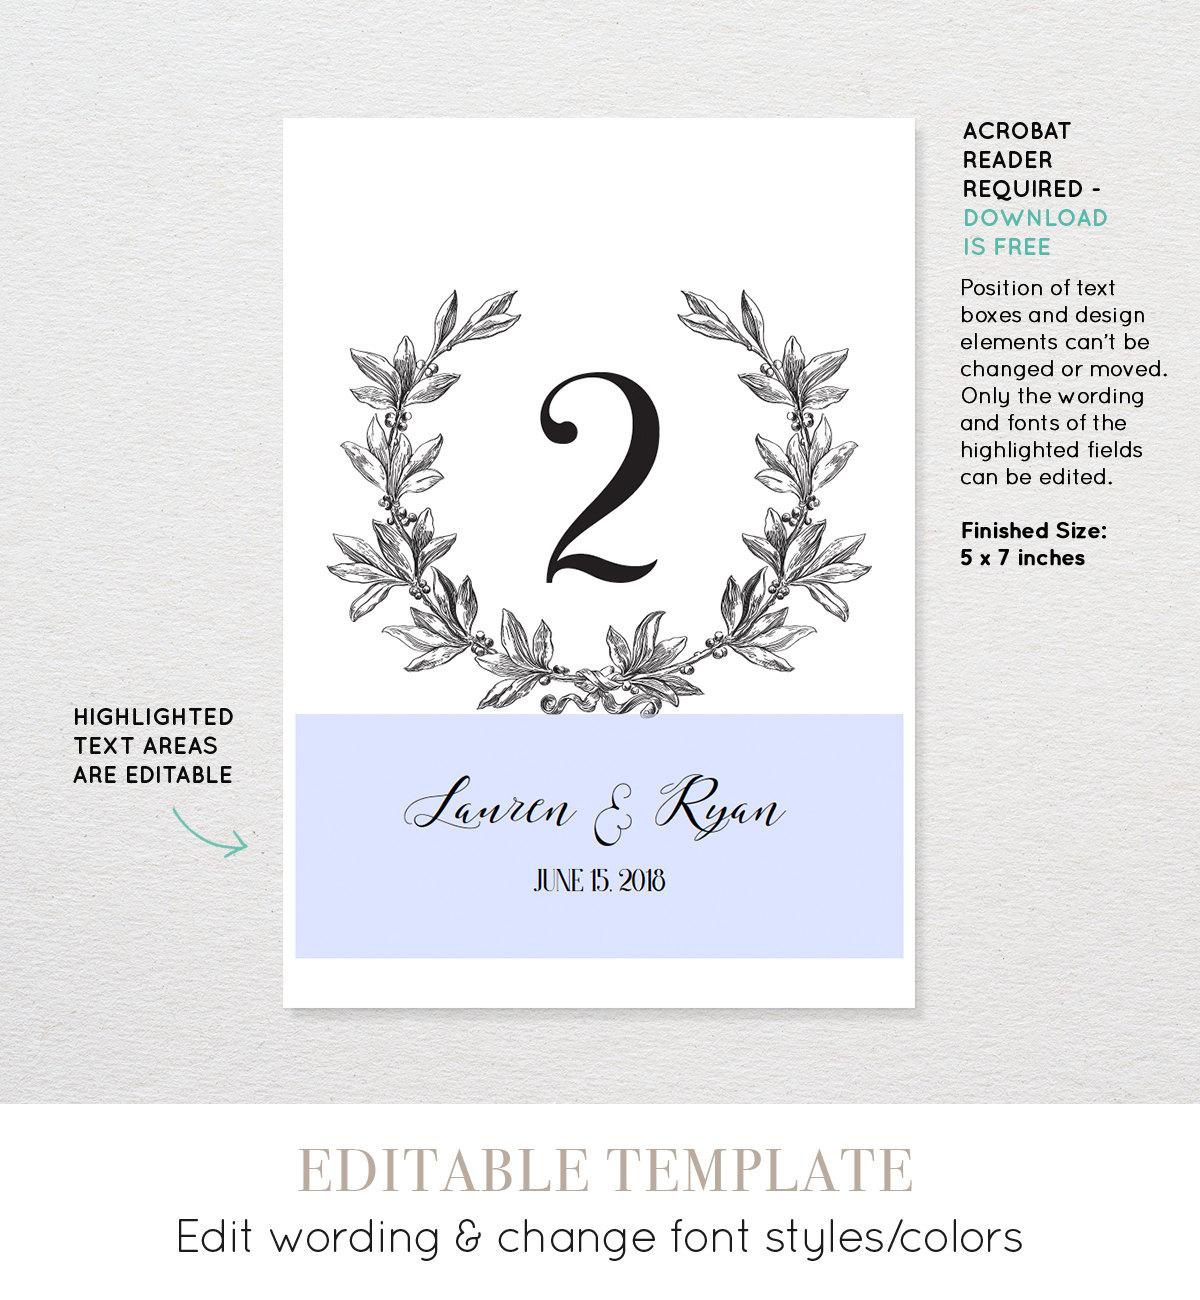 printable wedding table number card vintage wreath editable. Black Bedroom Furniture Sets. Home Design Ideas